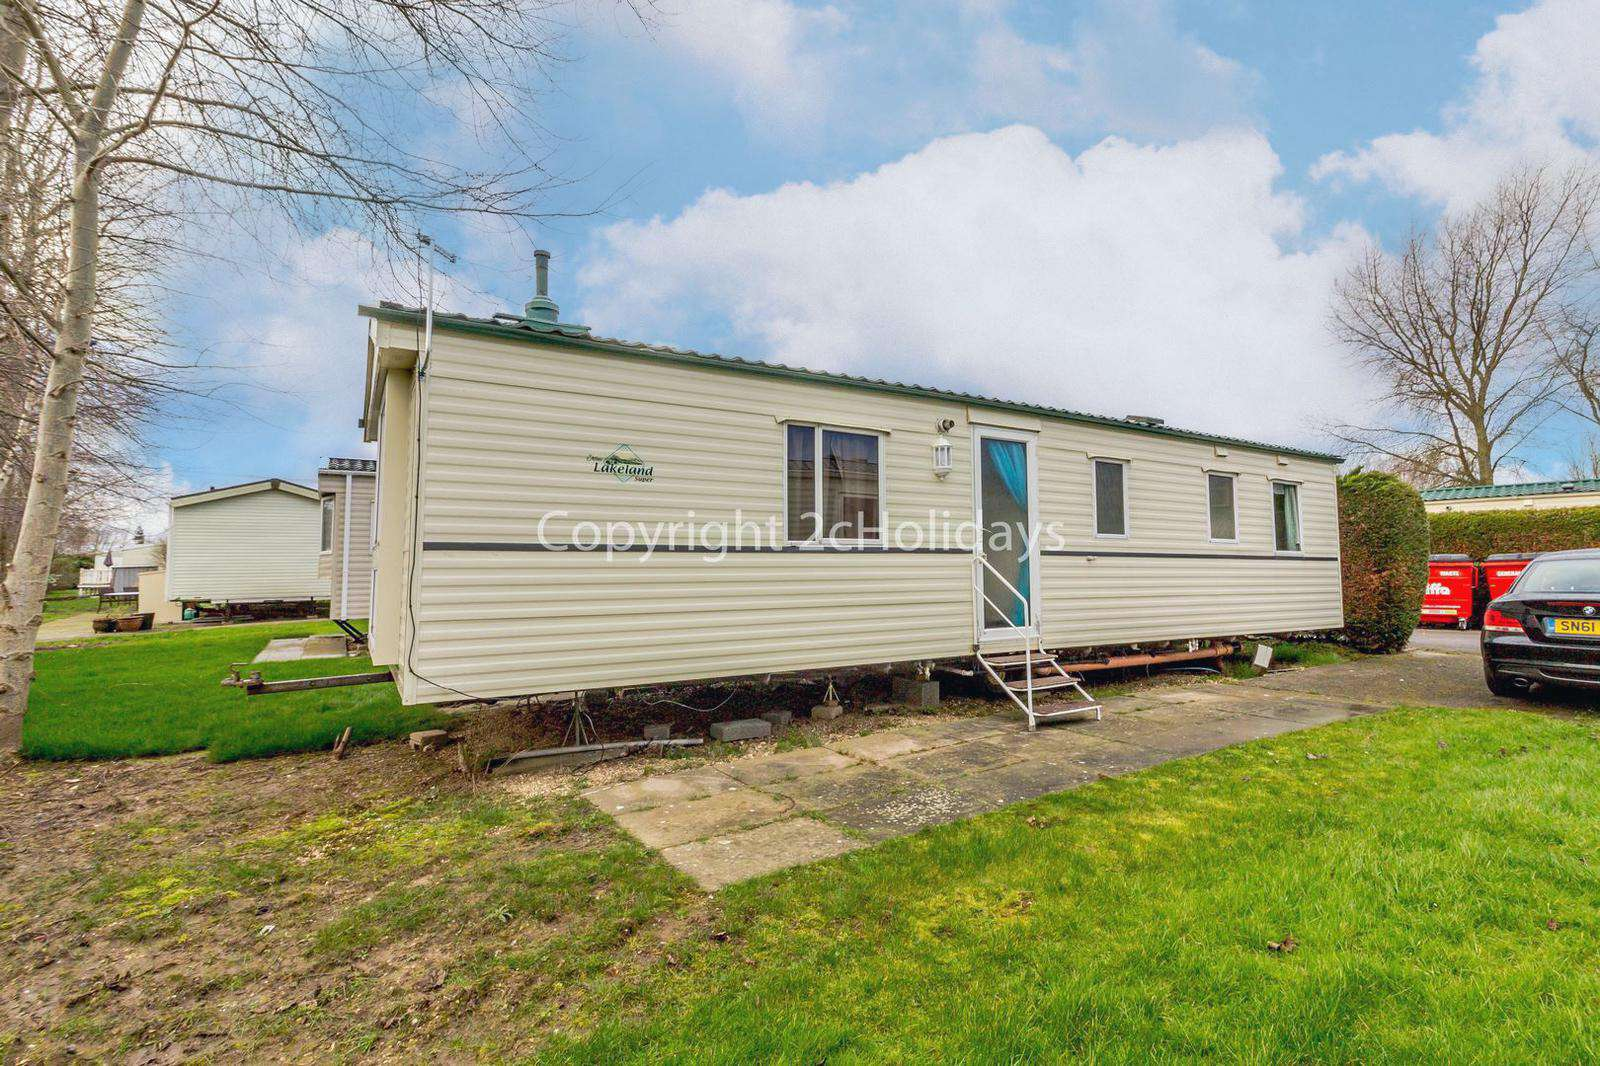 Homely caravan on a wonderful family park - property